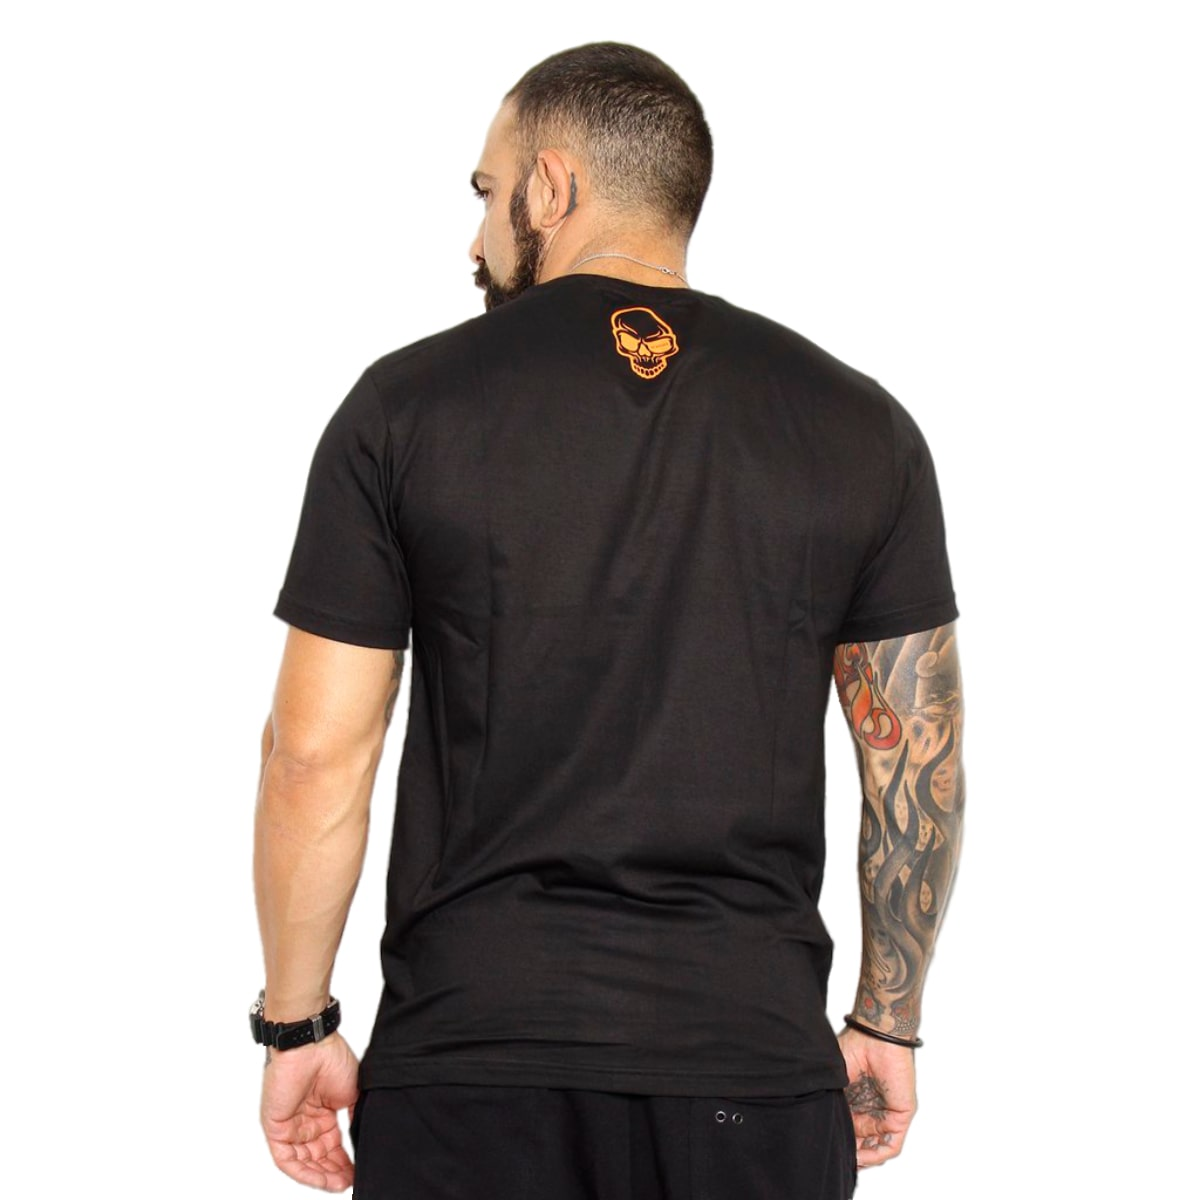 Camiseta Kvra Cross Combat - Preto